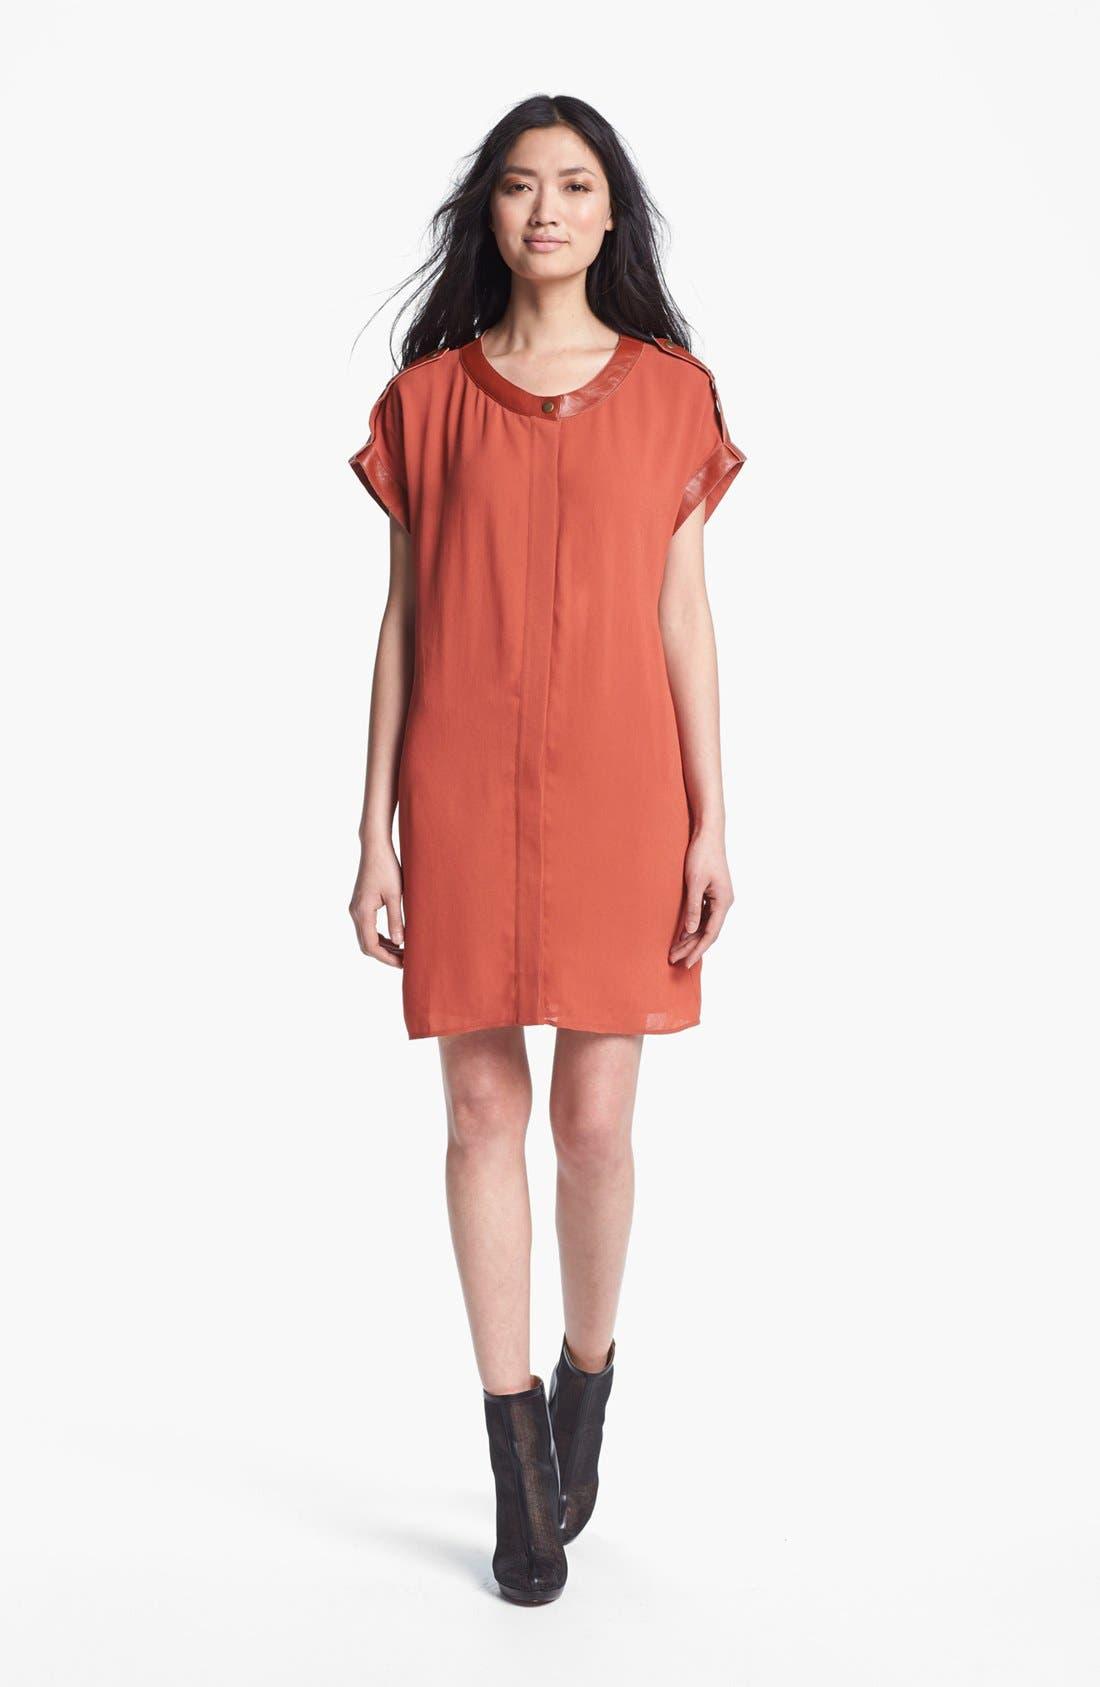 Alternate Image 1 Selected - Rachel Zoe 'Reyna' Crepe Dress